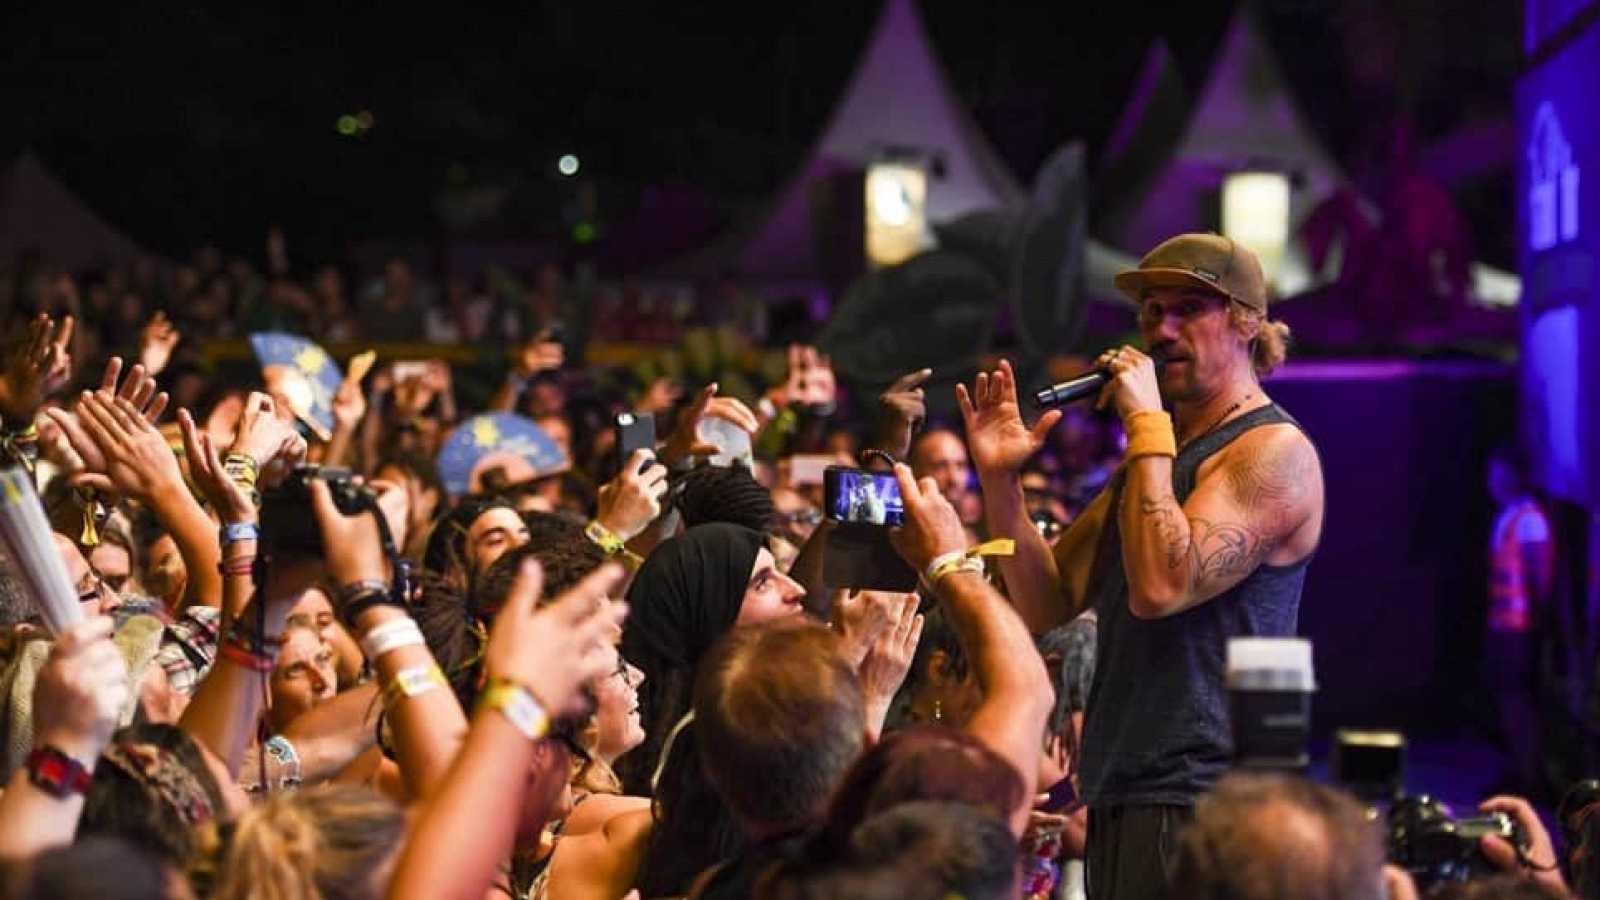 Festivales - Rototom 2019: Macaco - 20/08/19 - Escuchar ahora